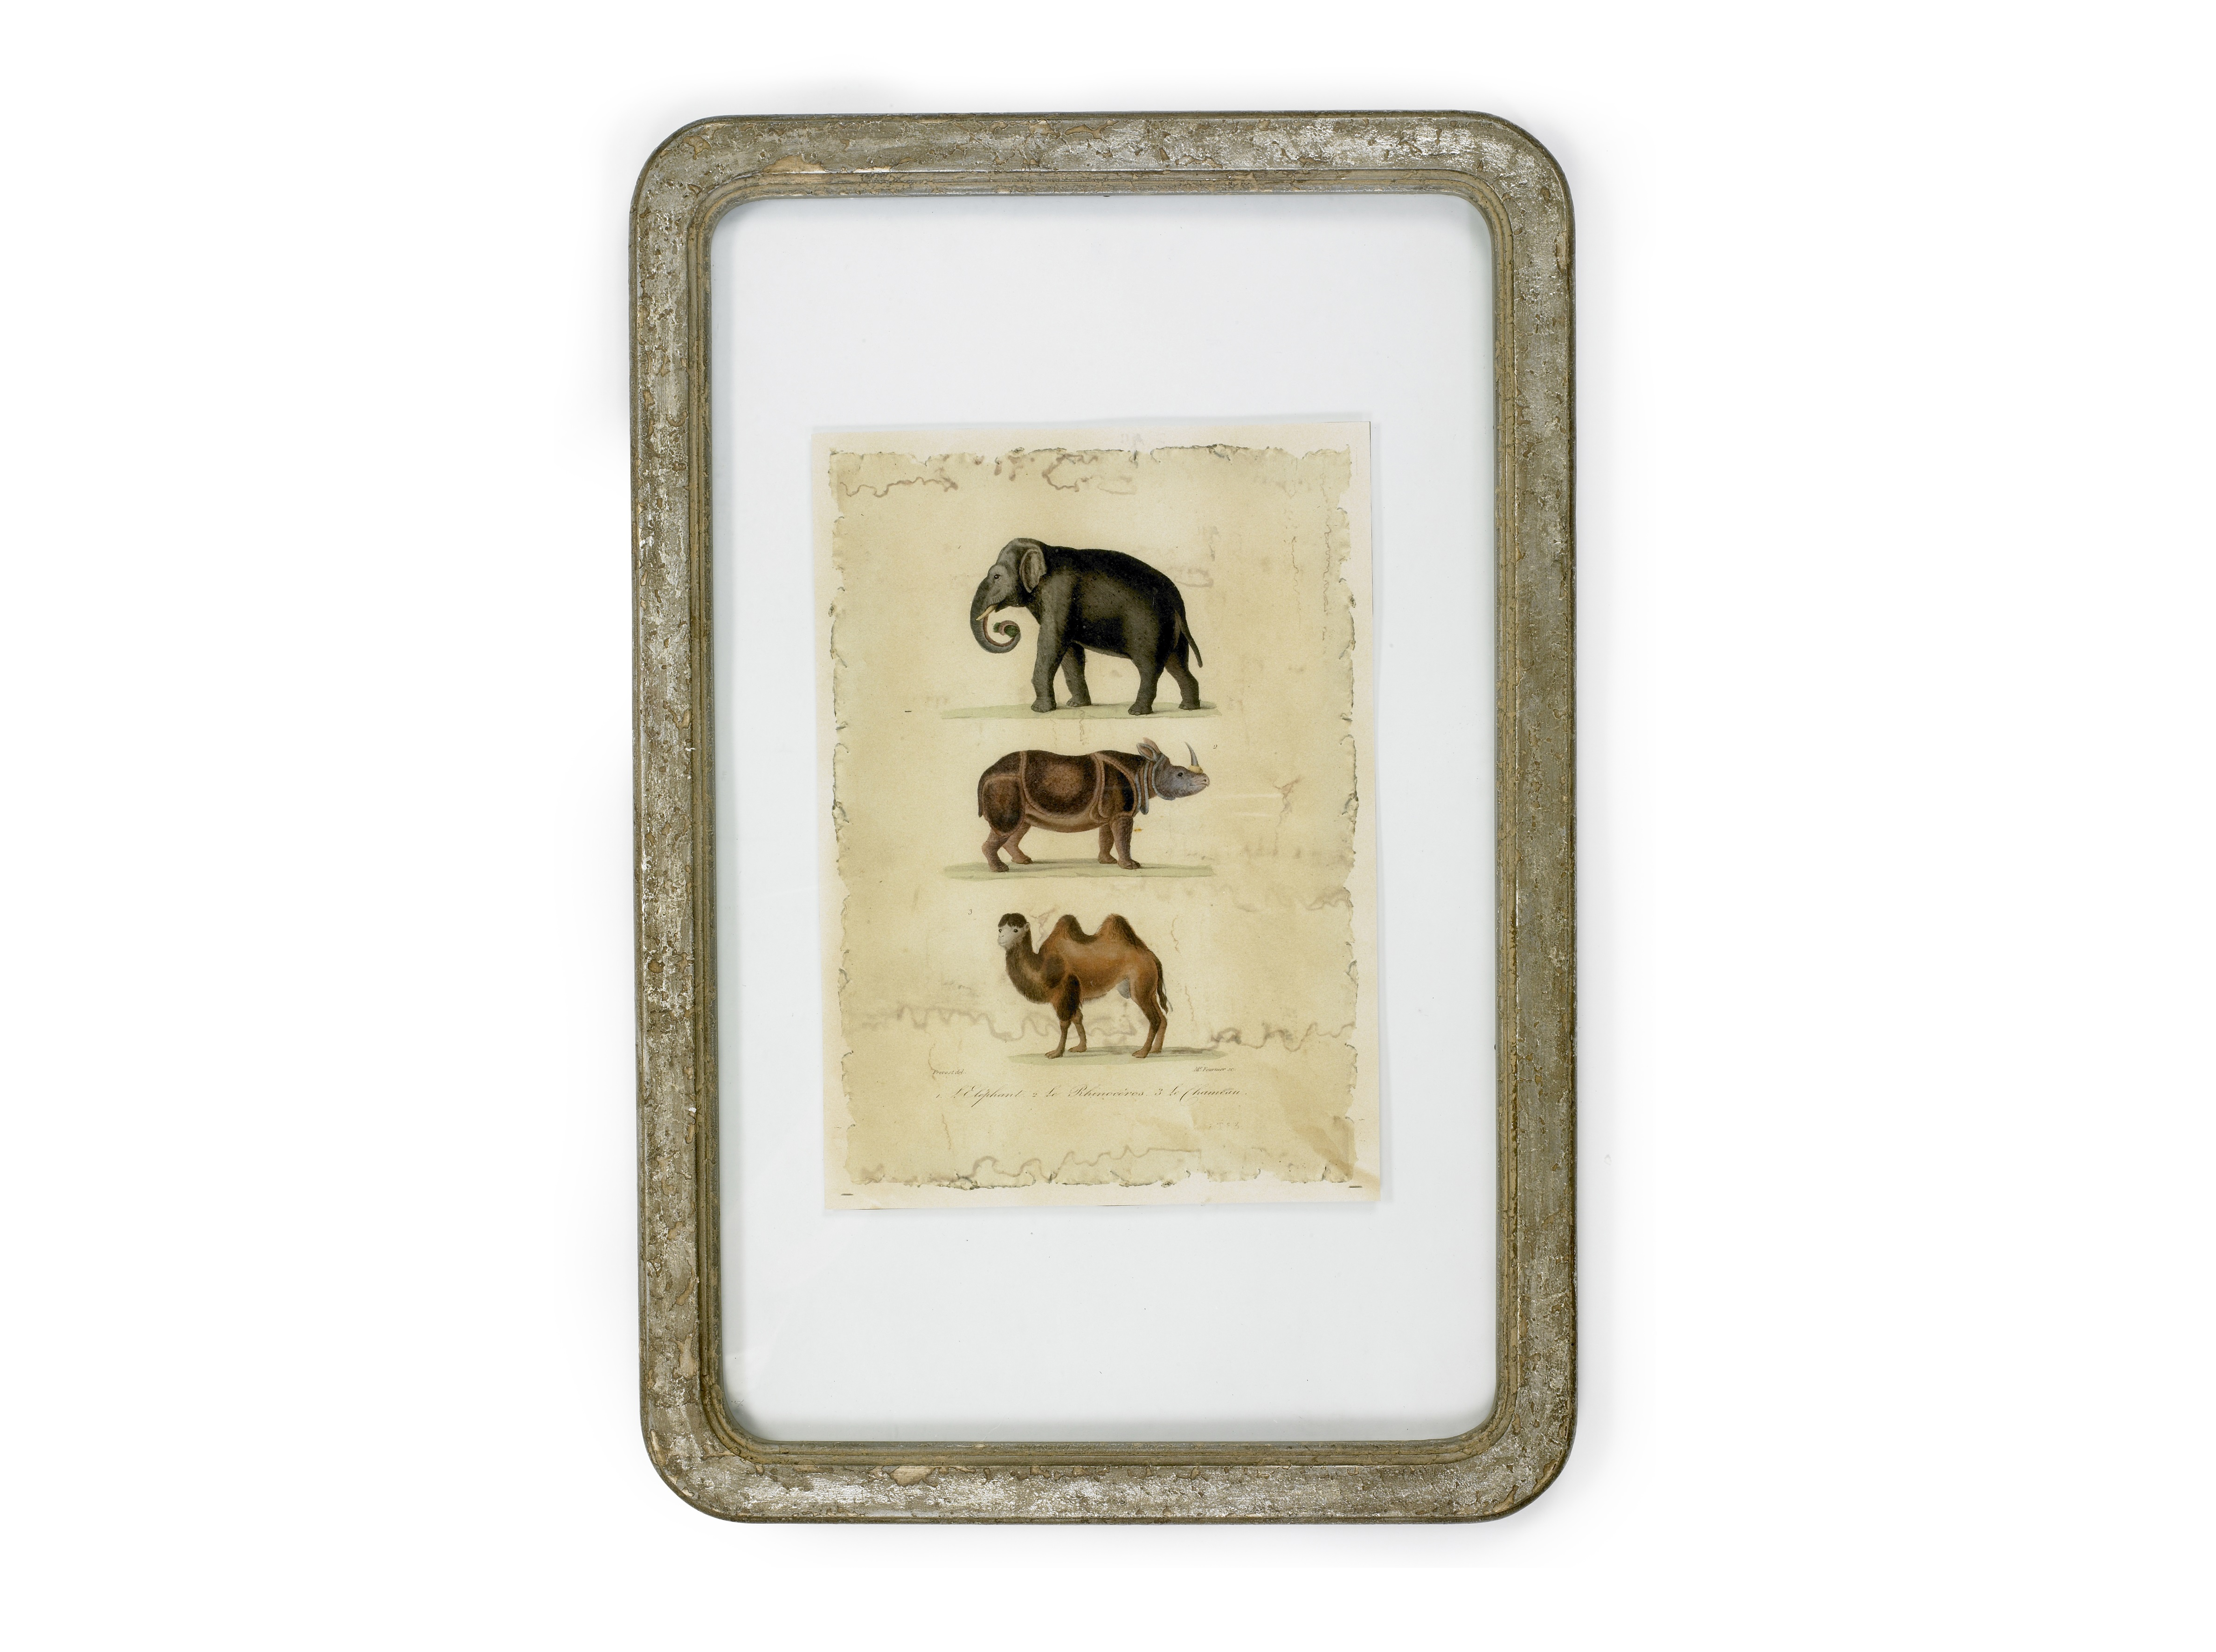 Иллюстрация AnimalsКартины<br><br><br>Material: Металл<br>Width см: 40<br>Depth см: 3<br>Height см: 60